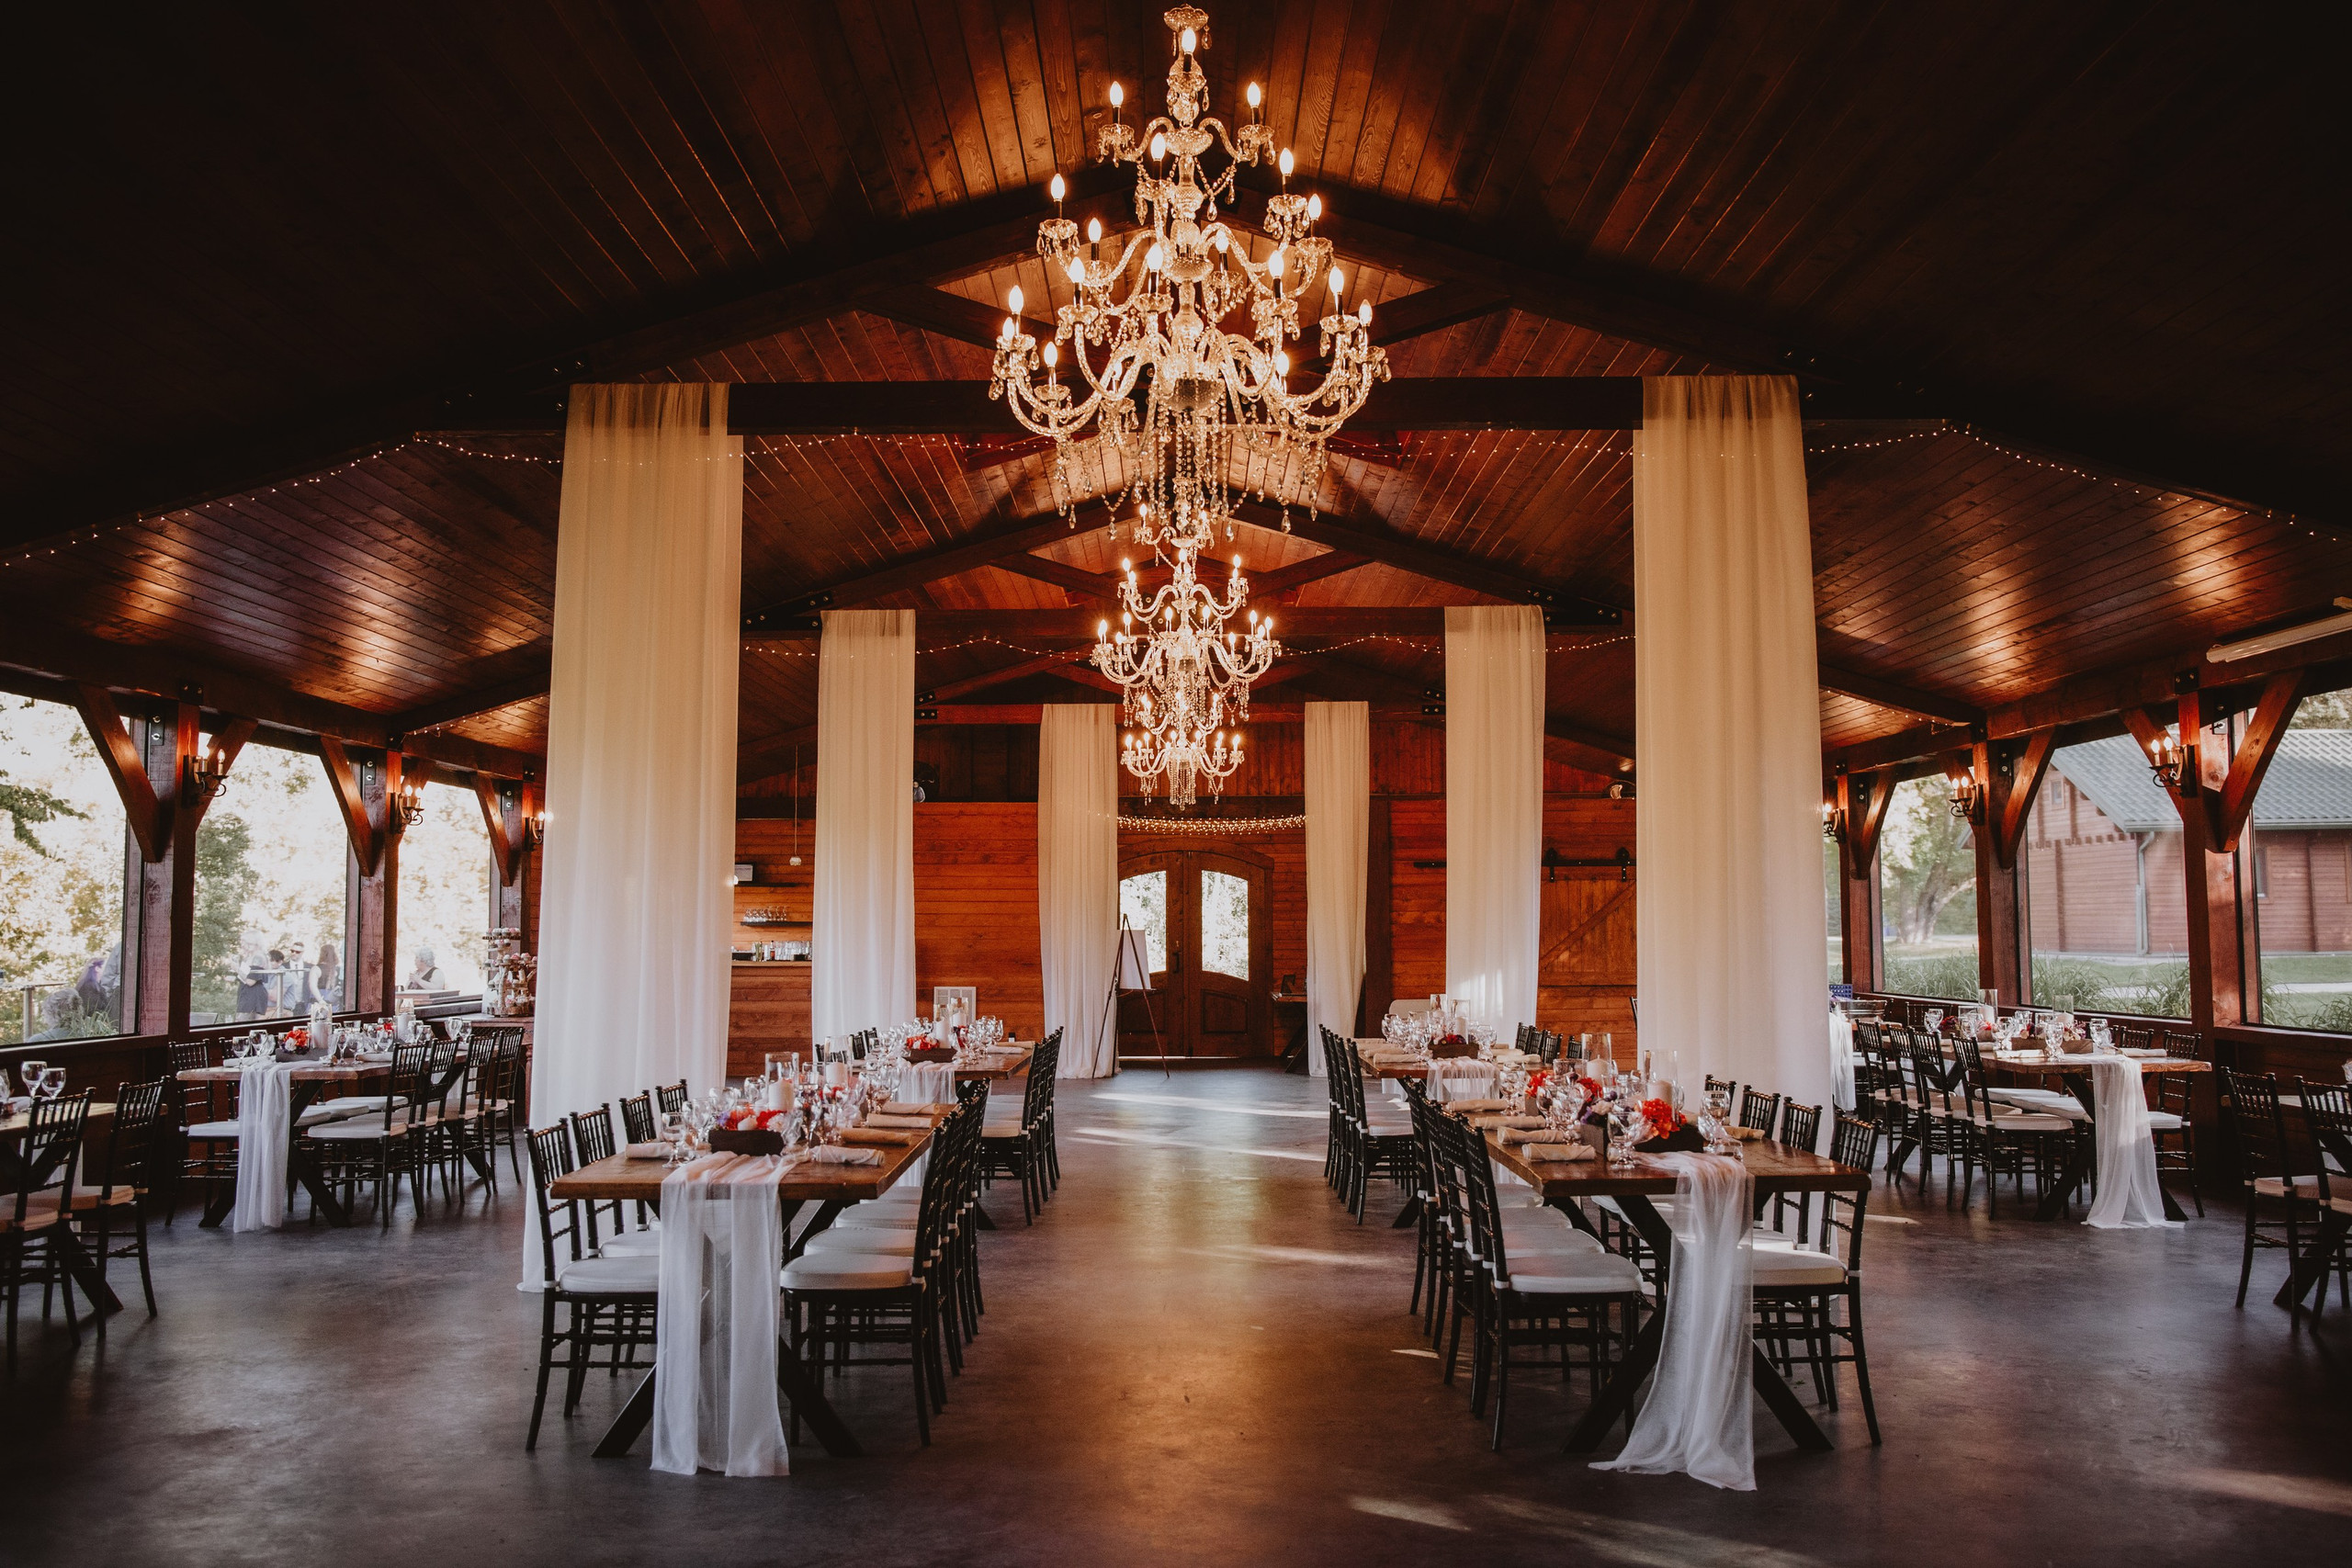 Fall Wedding Venue - Rivers Edge Resort in Elma, Manitoba.